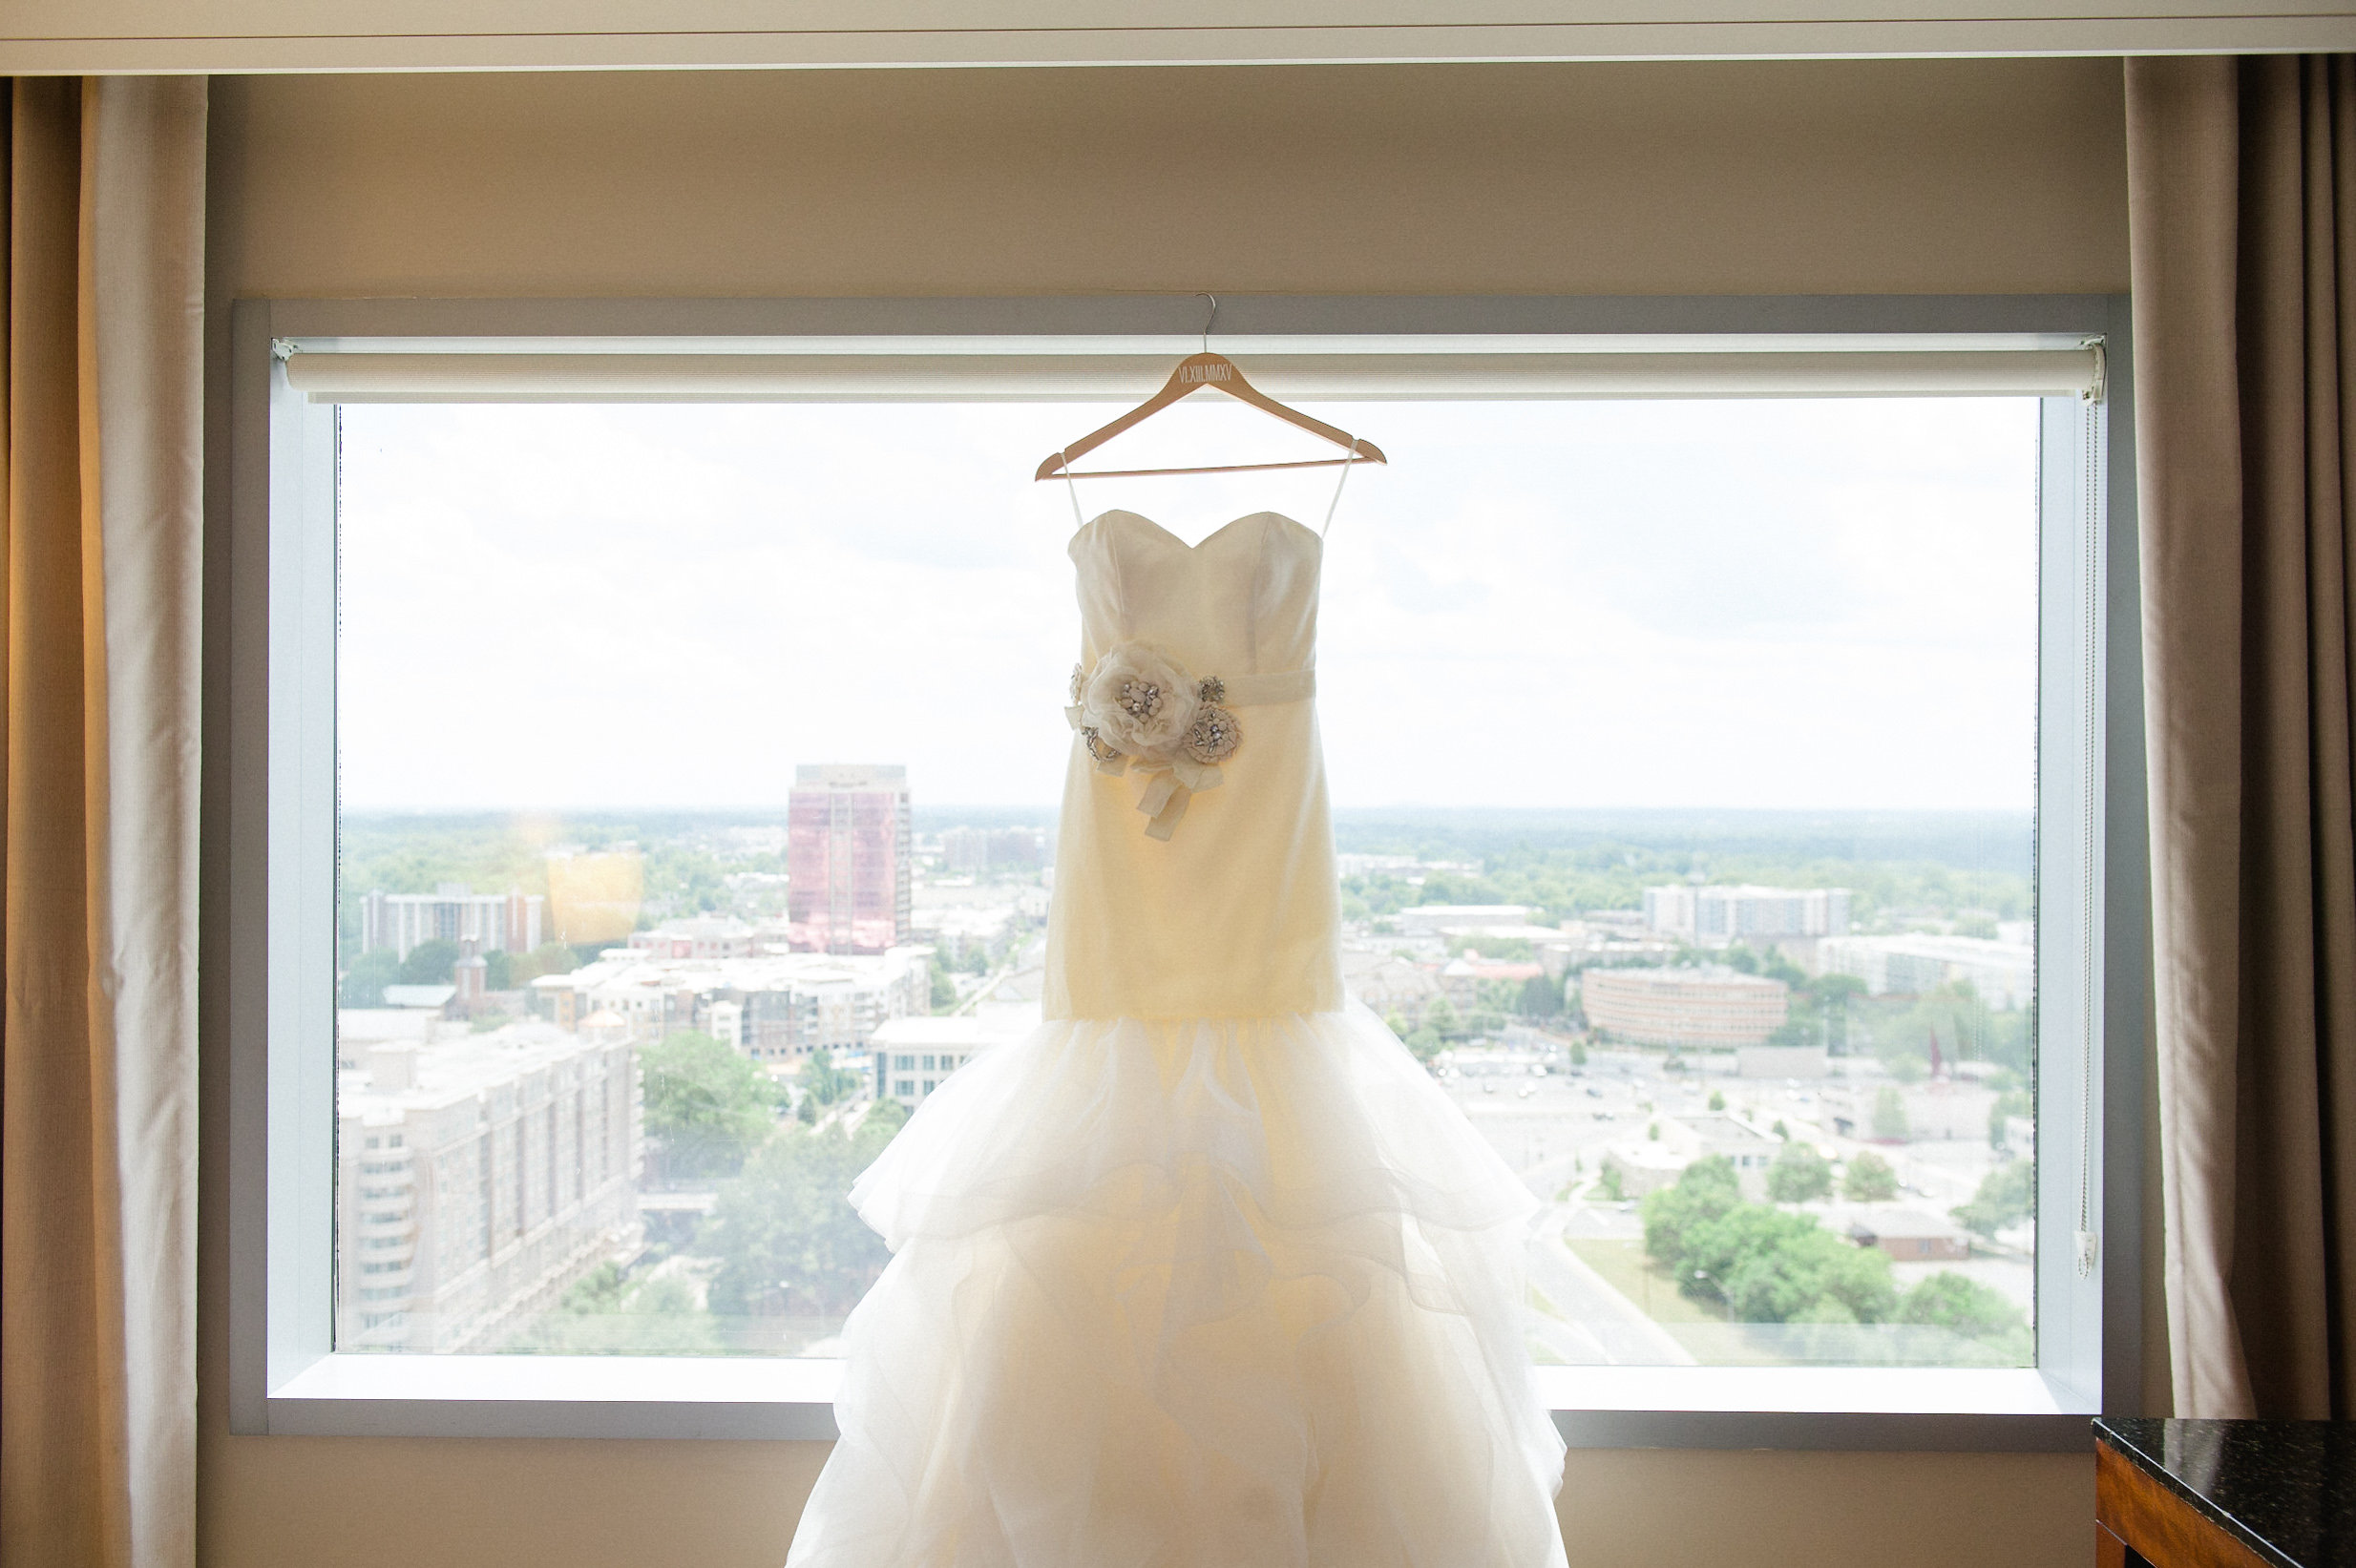 shelby&jordan|smitten&hooked|wedding|details-001.jpg